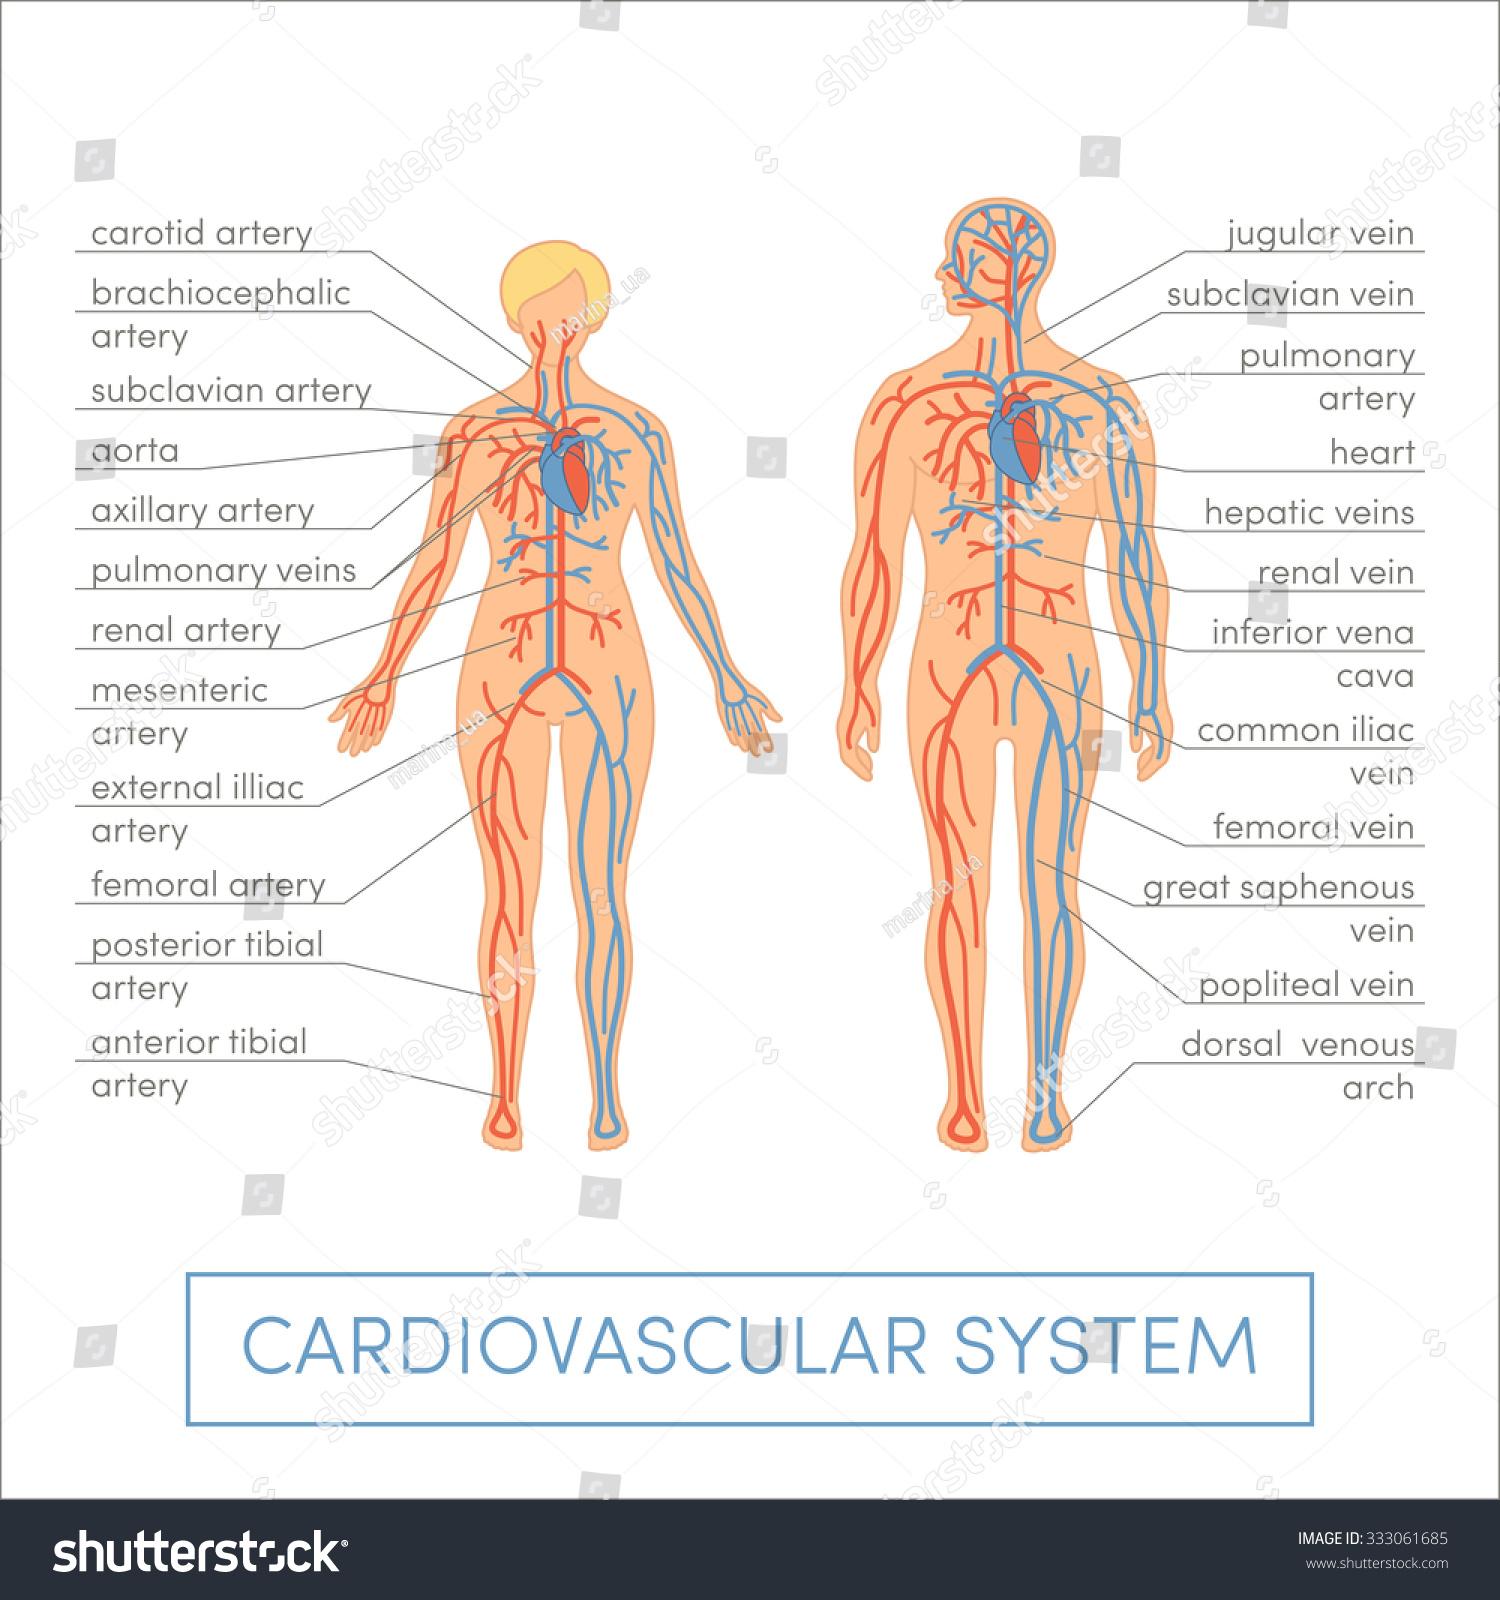 Cardiovascular System Human Cartoon Vector Illustration Stock Vector ...